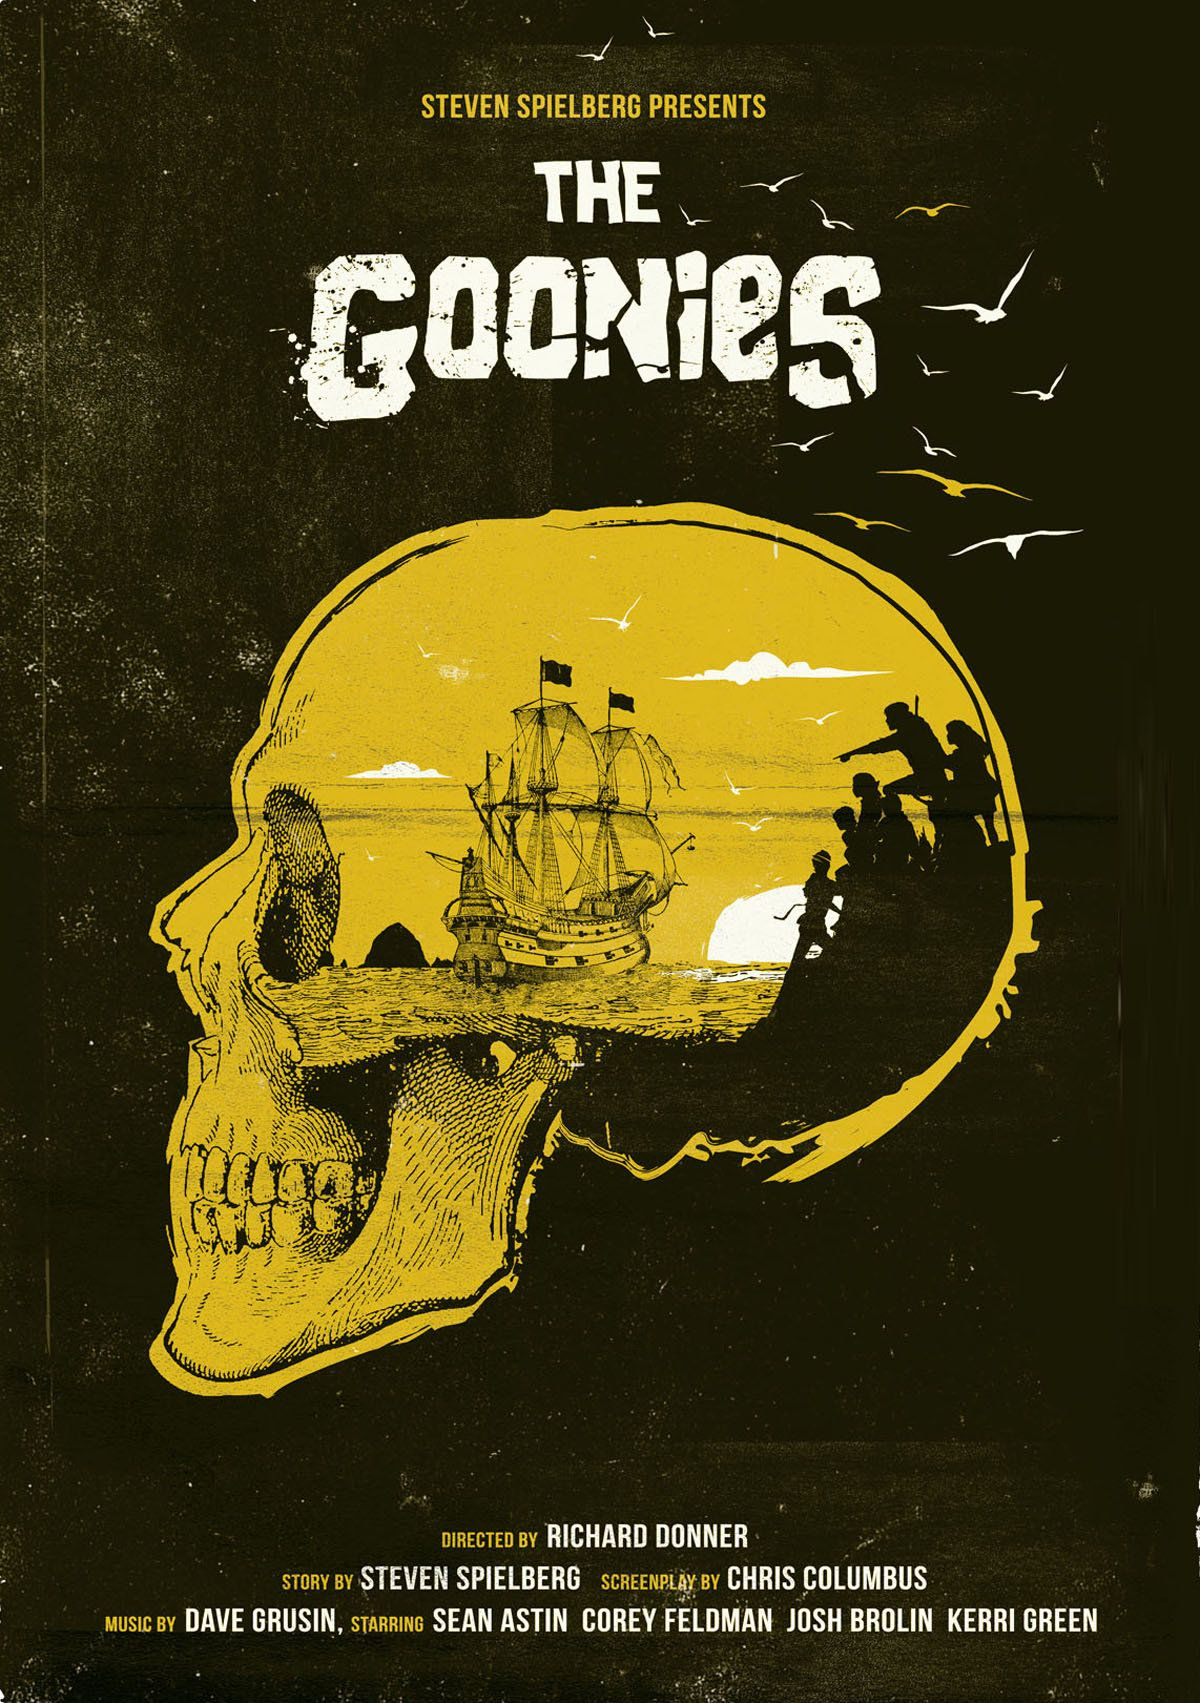 The Goonies | Bates Motel | Pinterest | Movie, 80s movies and Bates ...